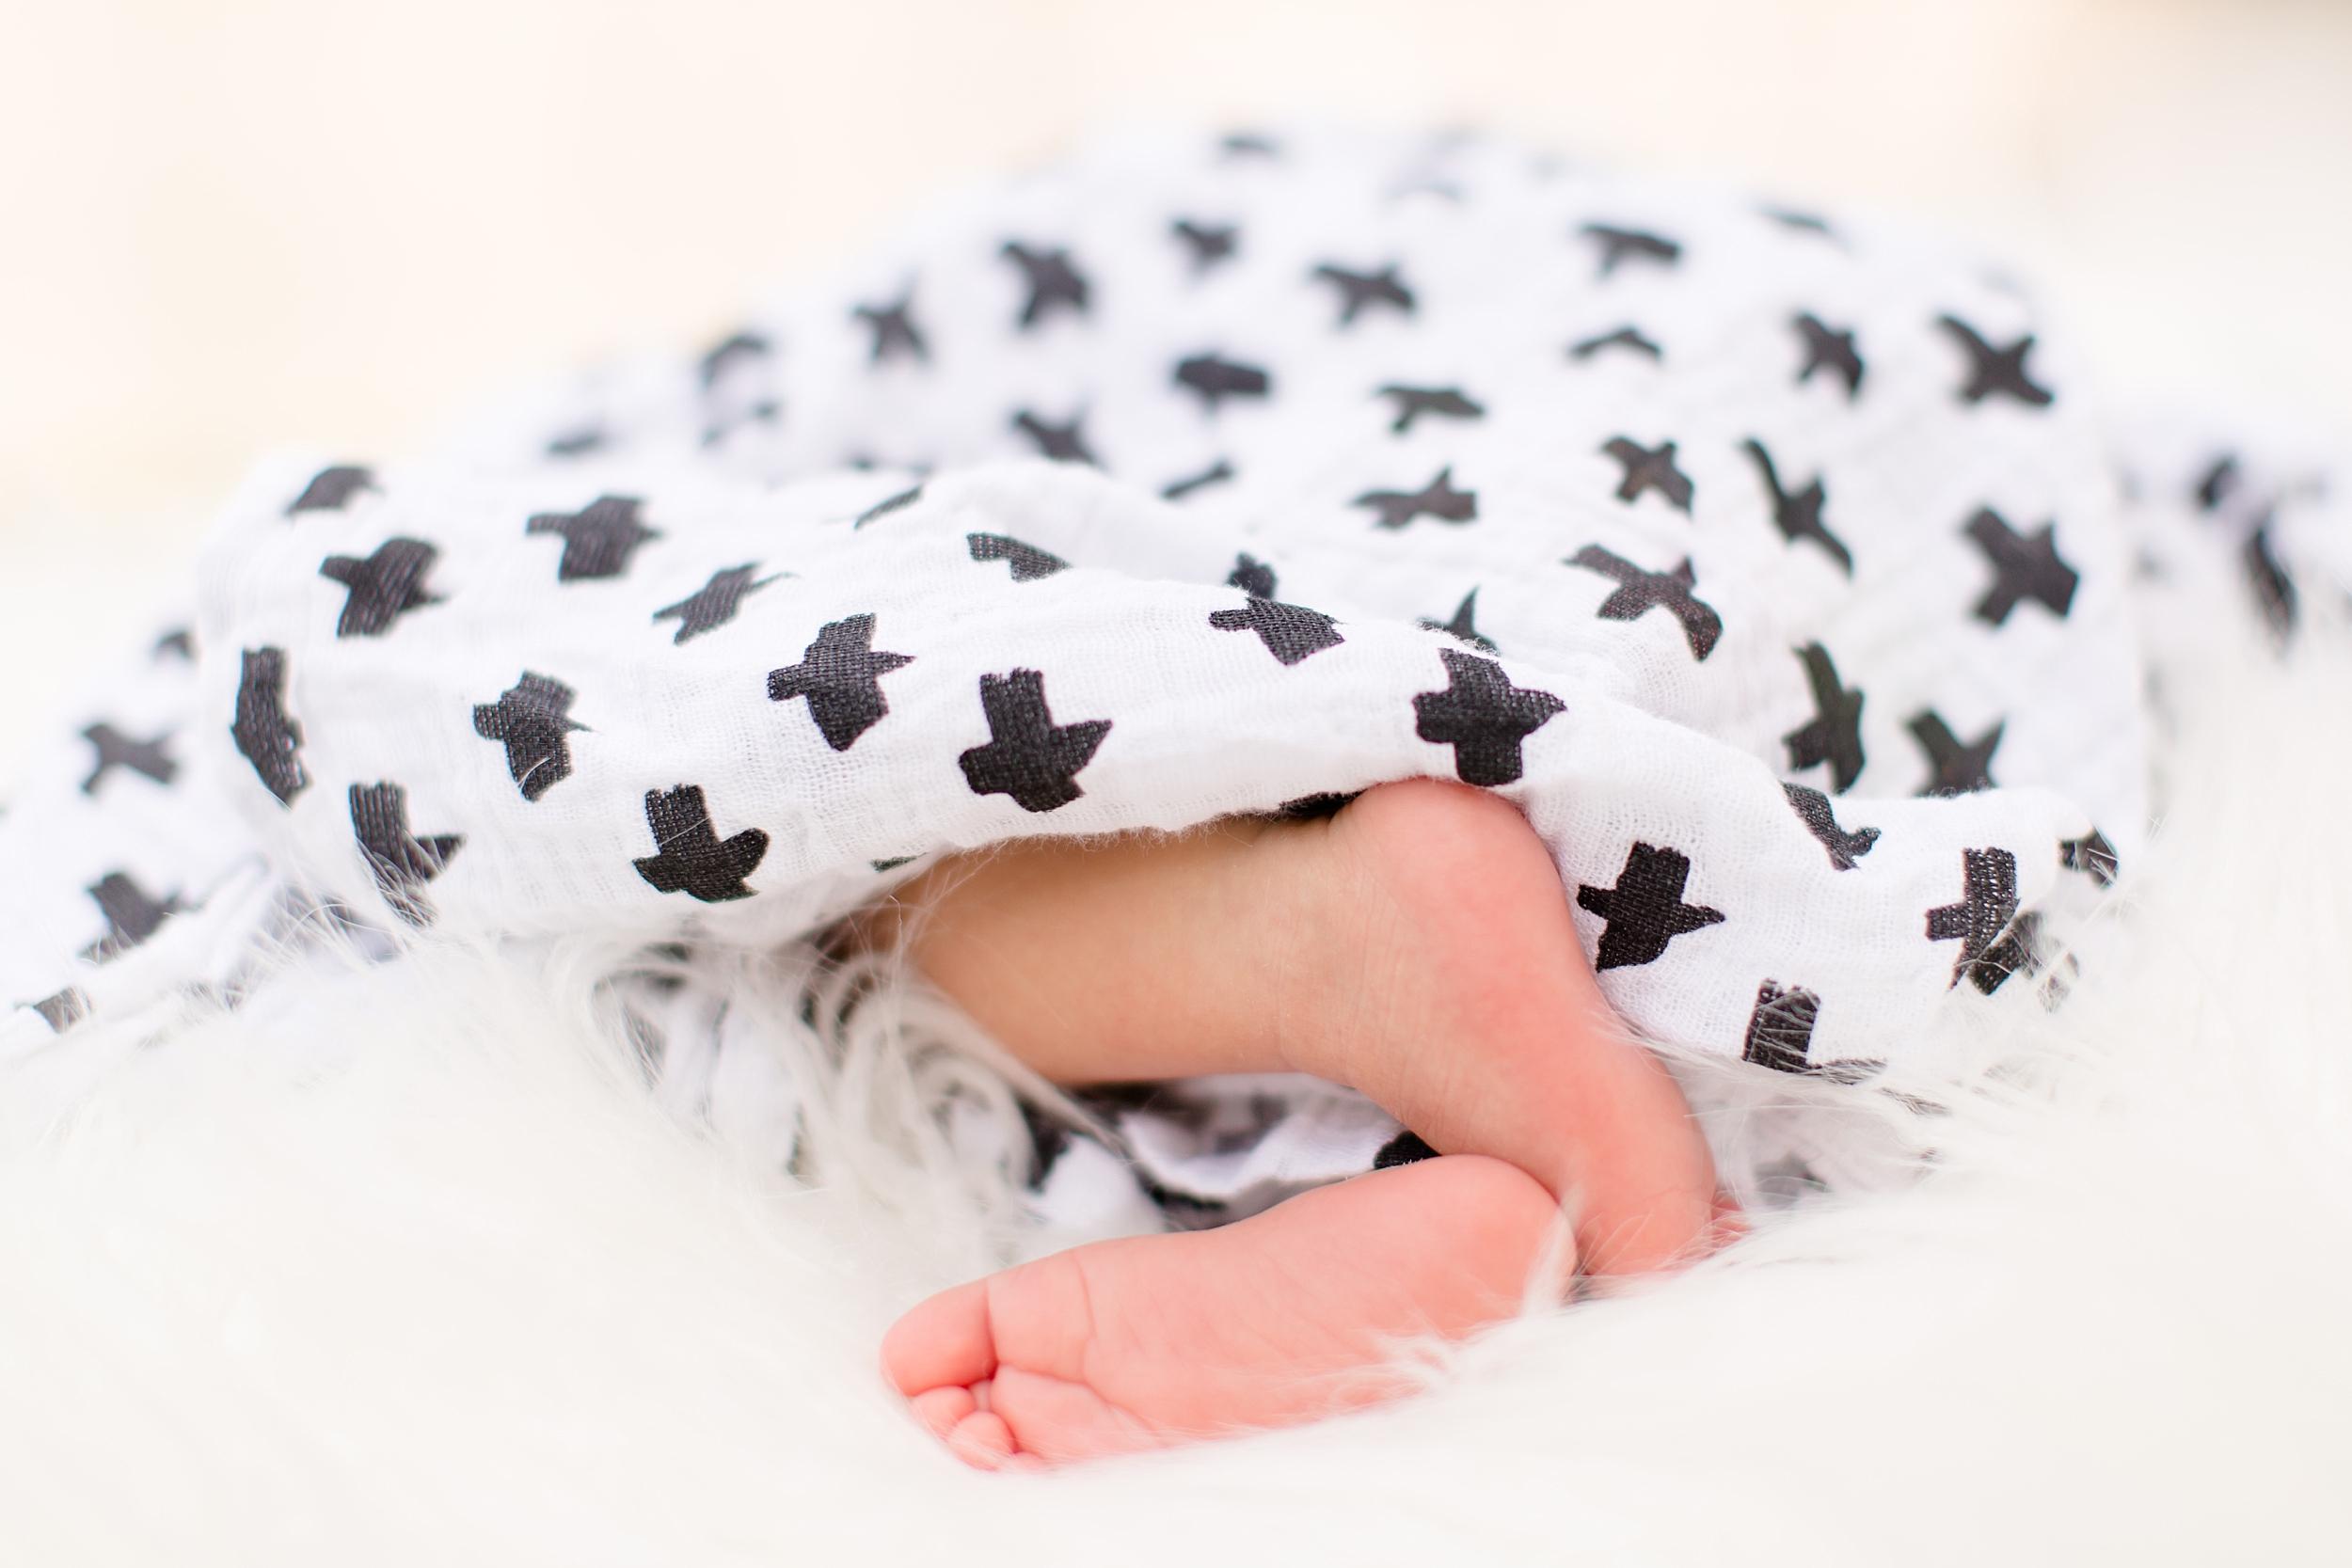 Landon-Schneider-Photography-Newborn-Session-Texas_0075.jpg